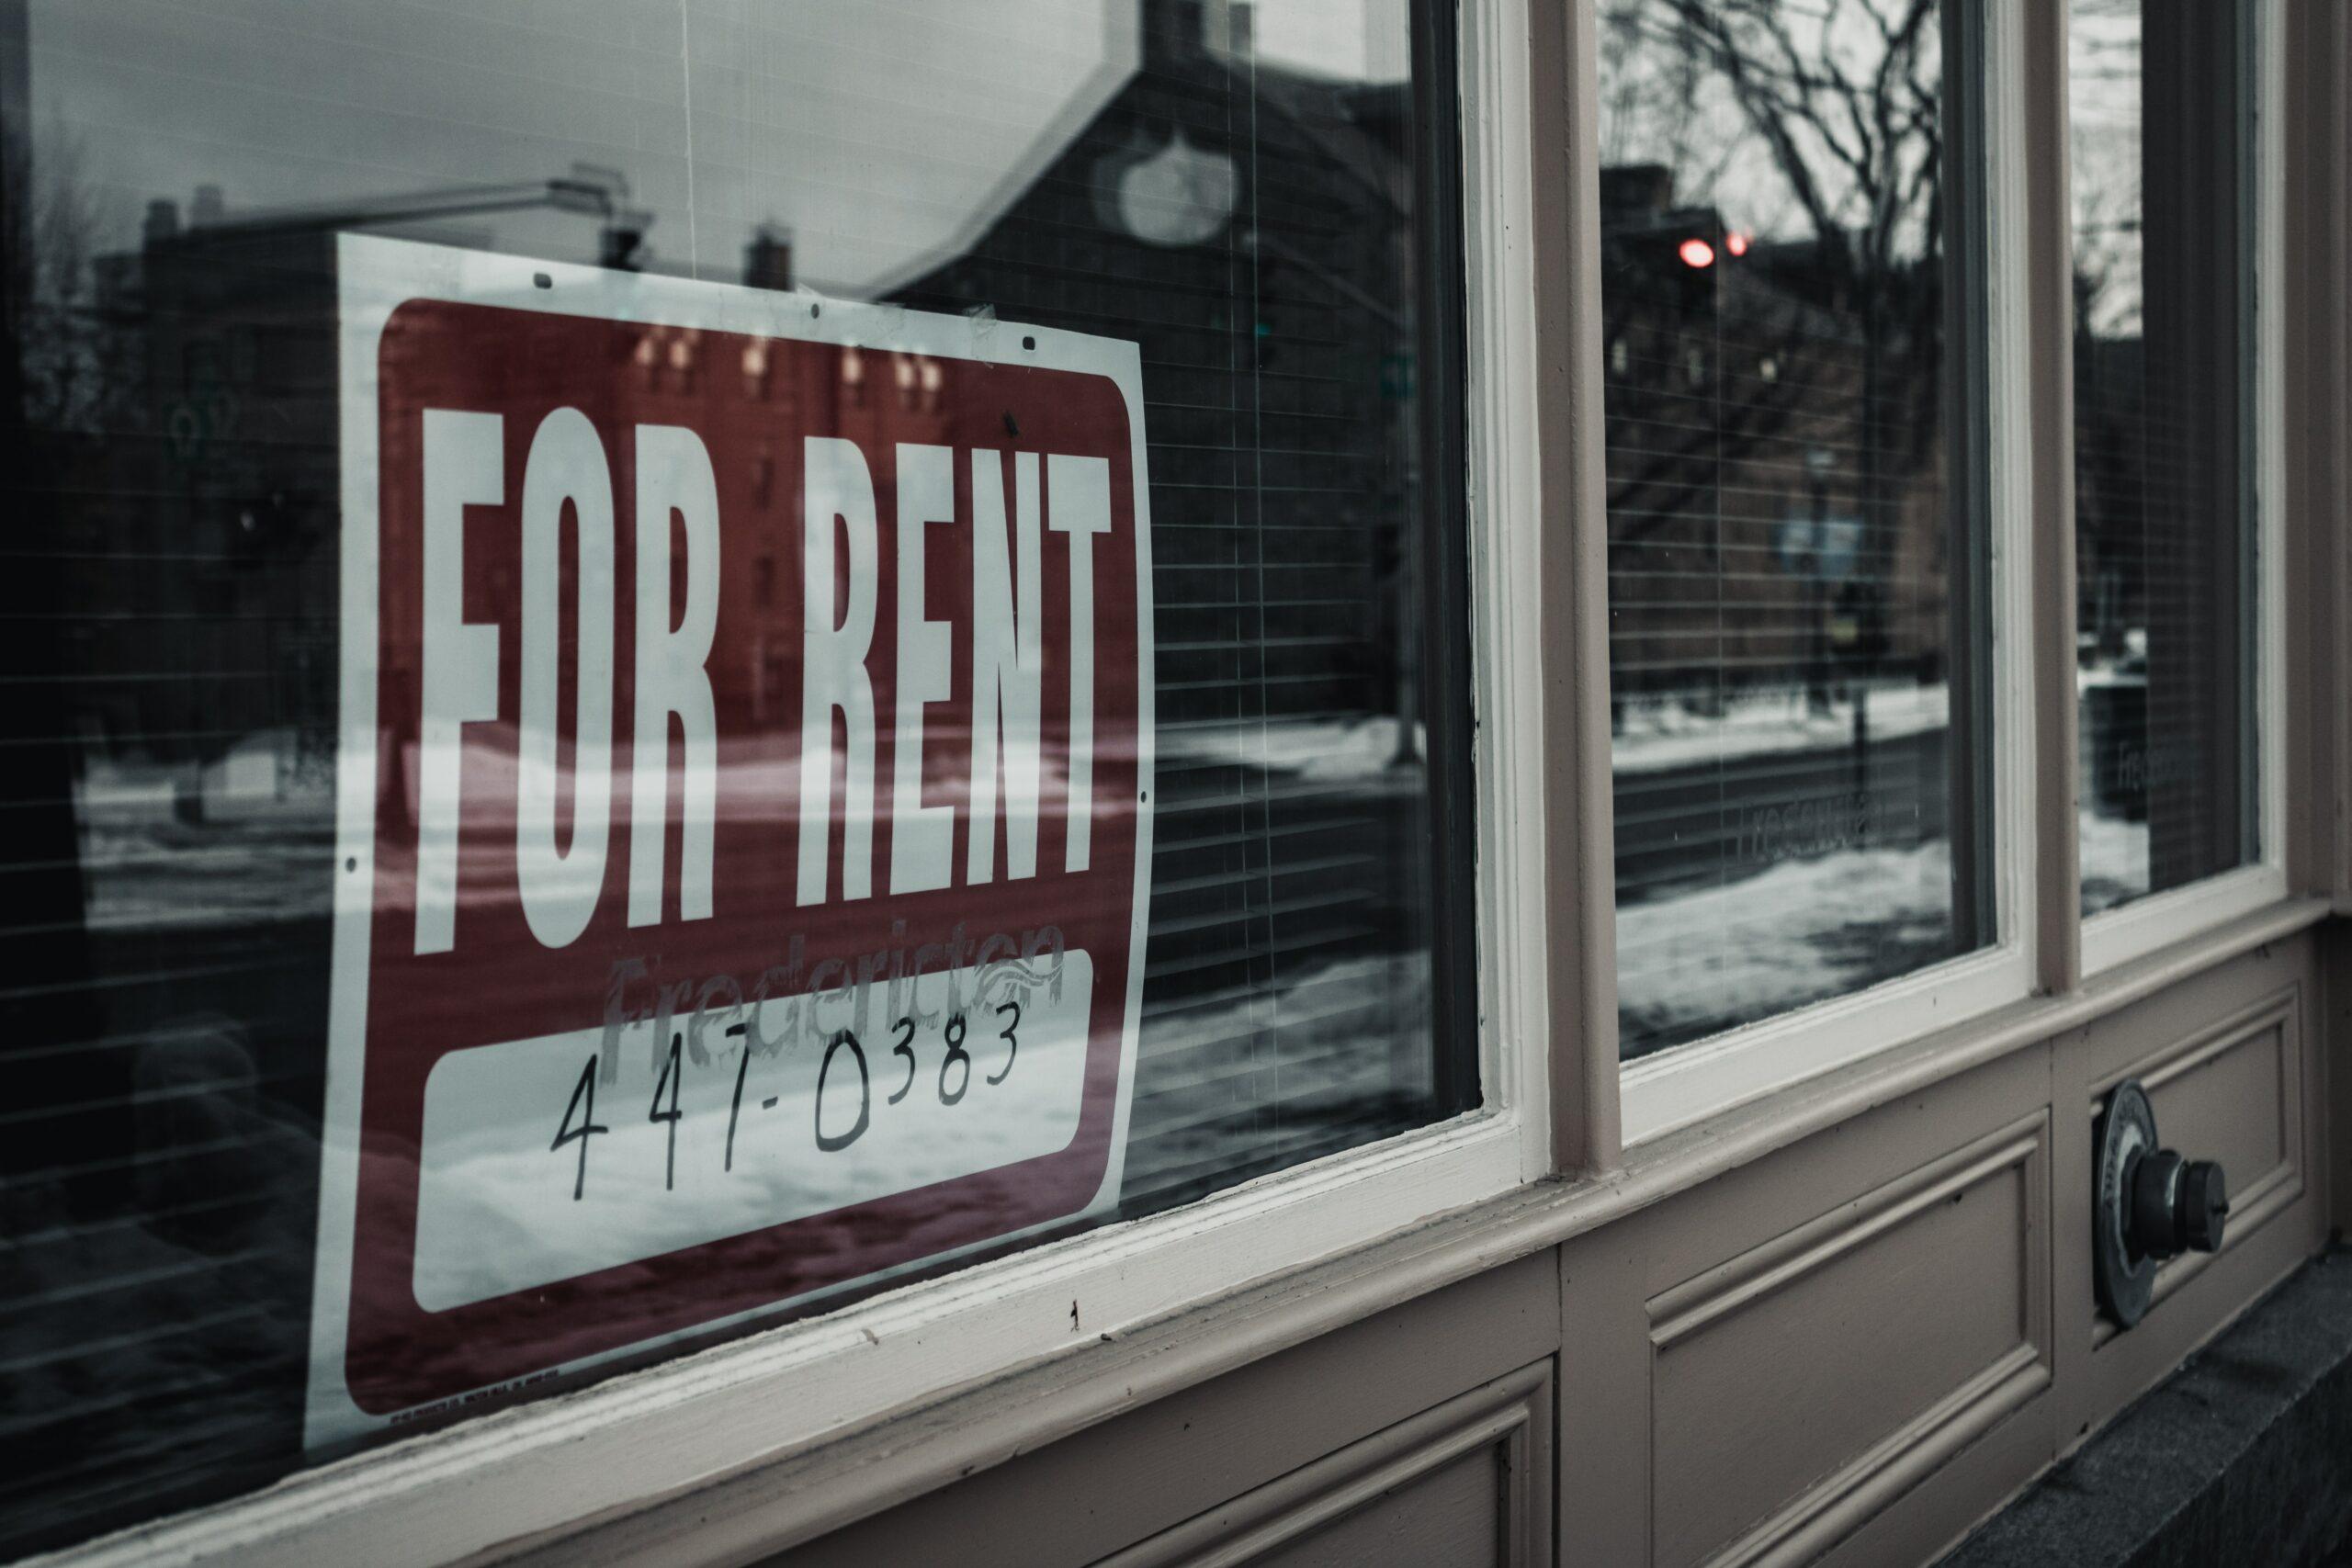 Marin County, California - Rental Assistance - Aaron Sousa/Unsplash